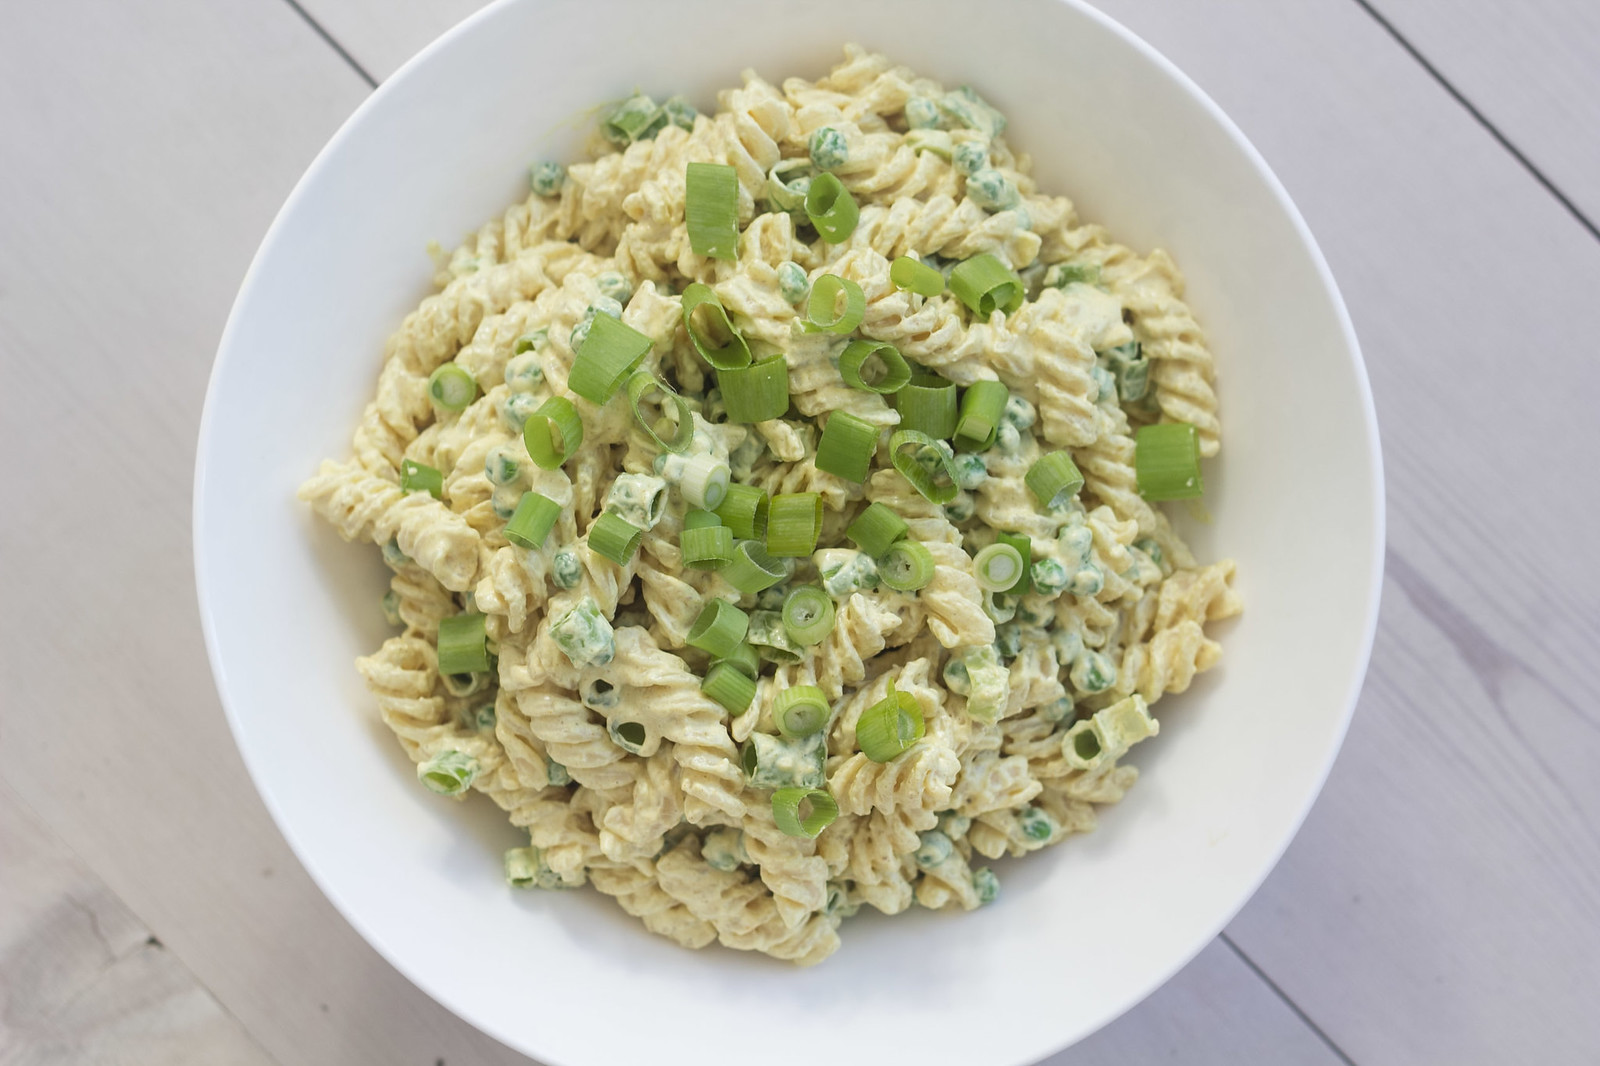 Recipe for Homemade Creamy Curry pasta